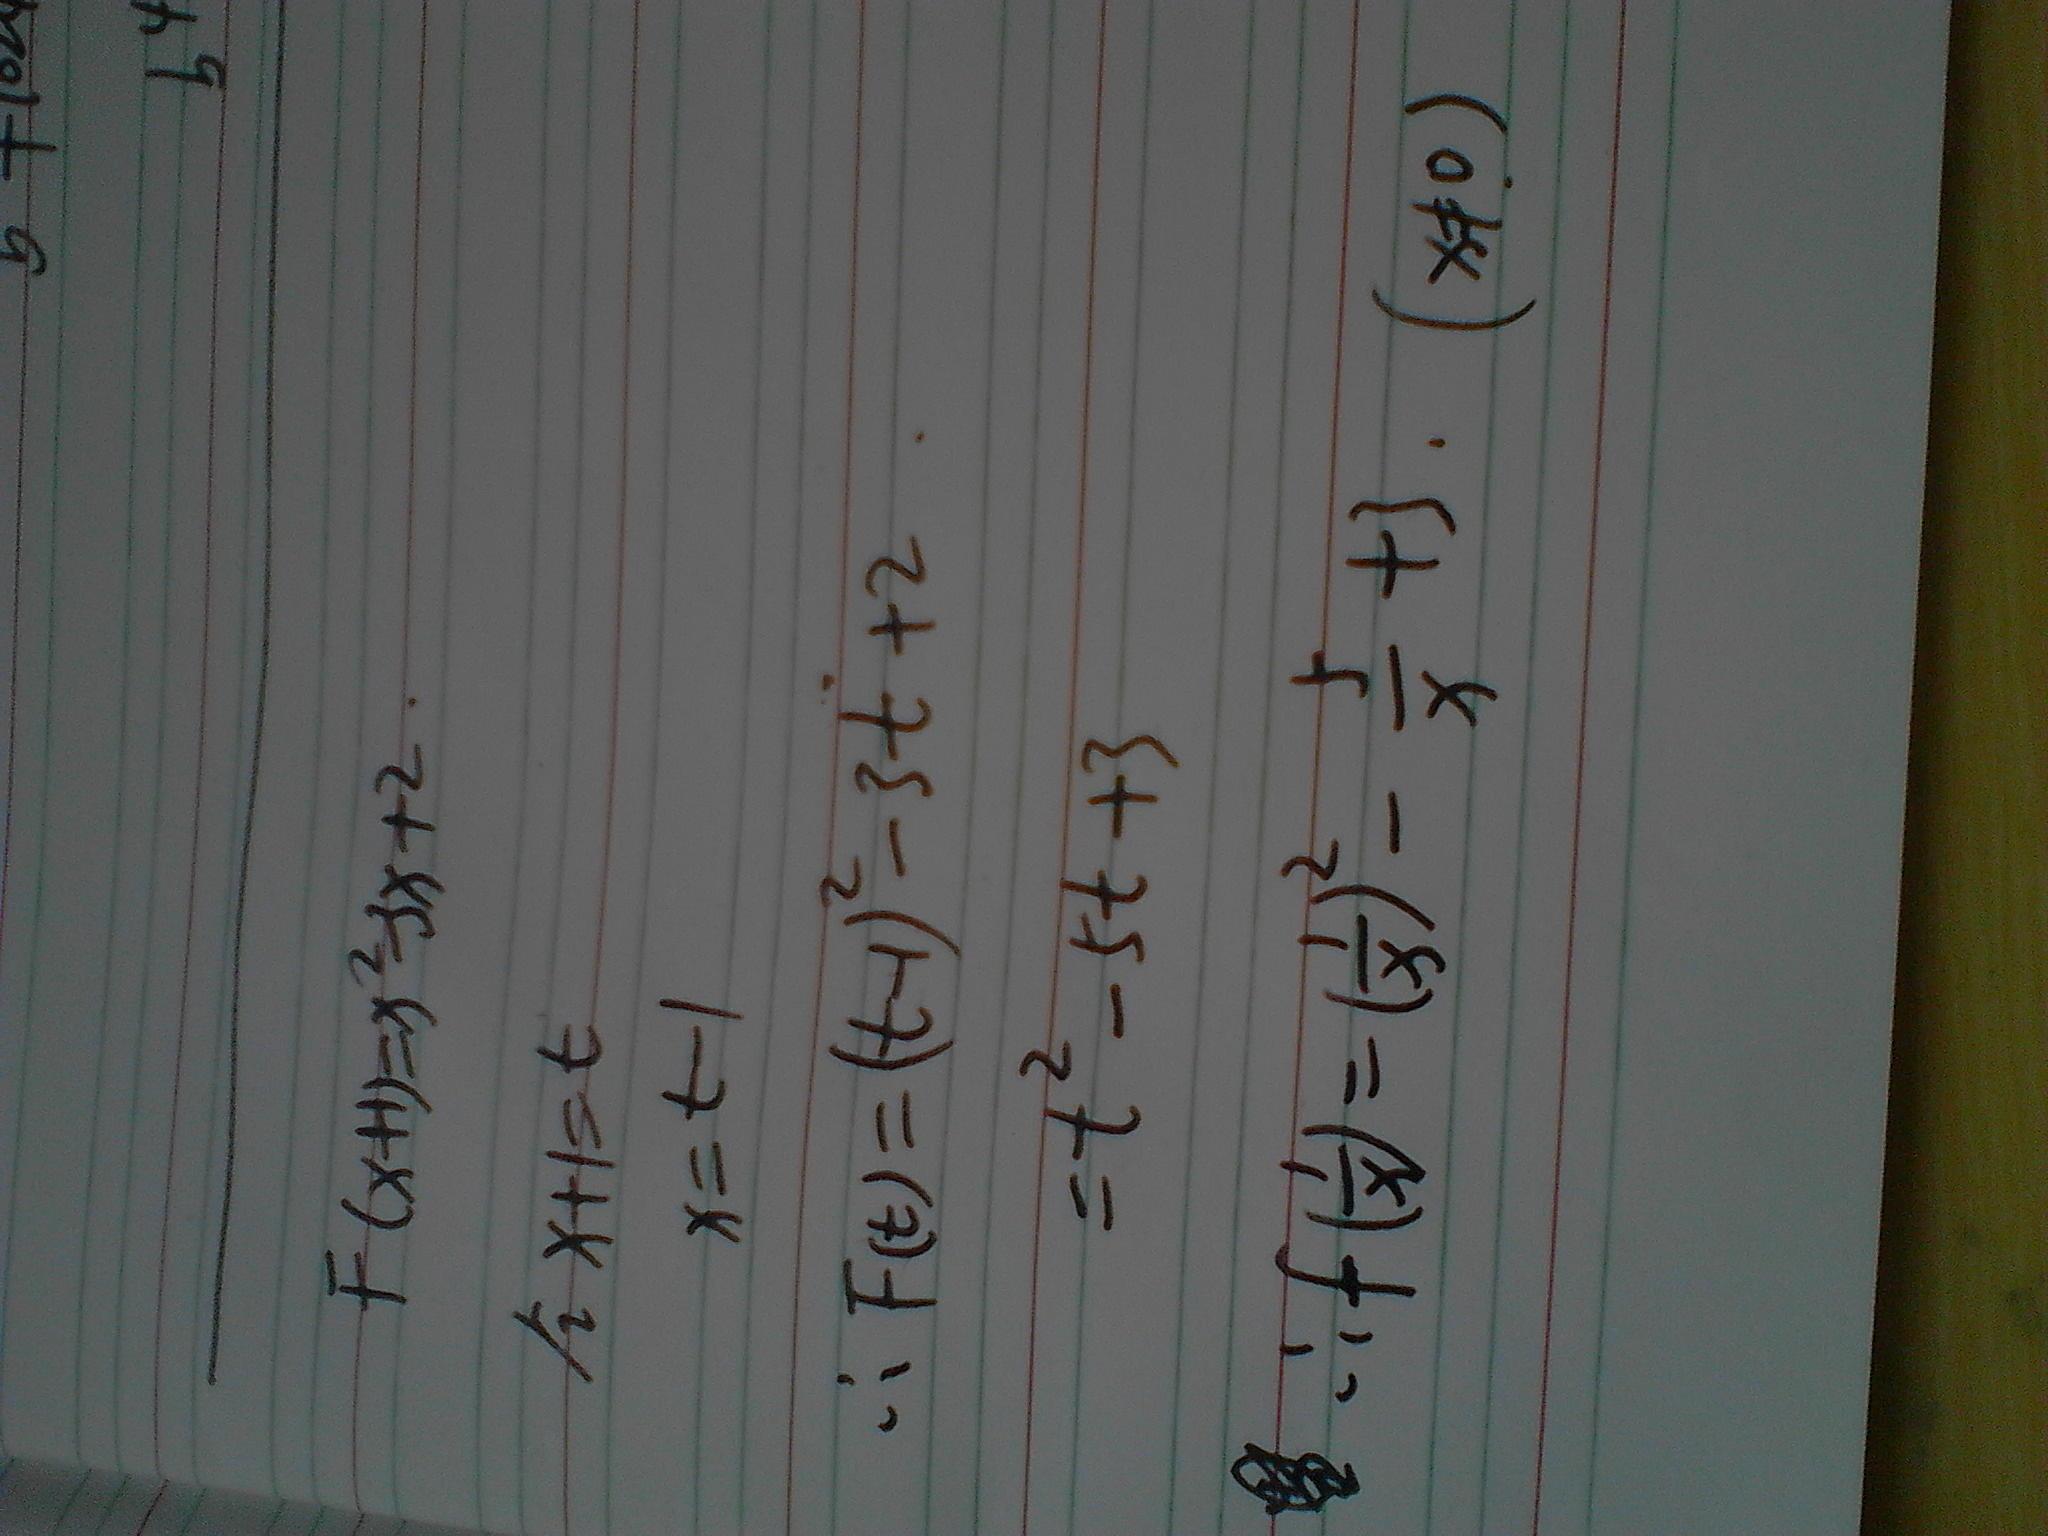 已知方程3x 2a 12和方程4 x 2分之1 1 5x 3的解方程高清图片